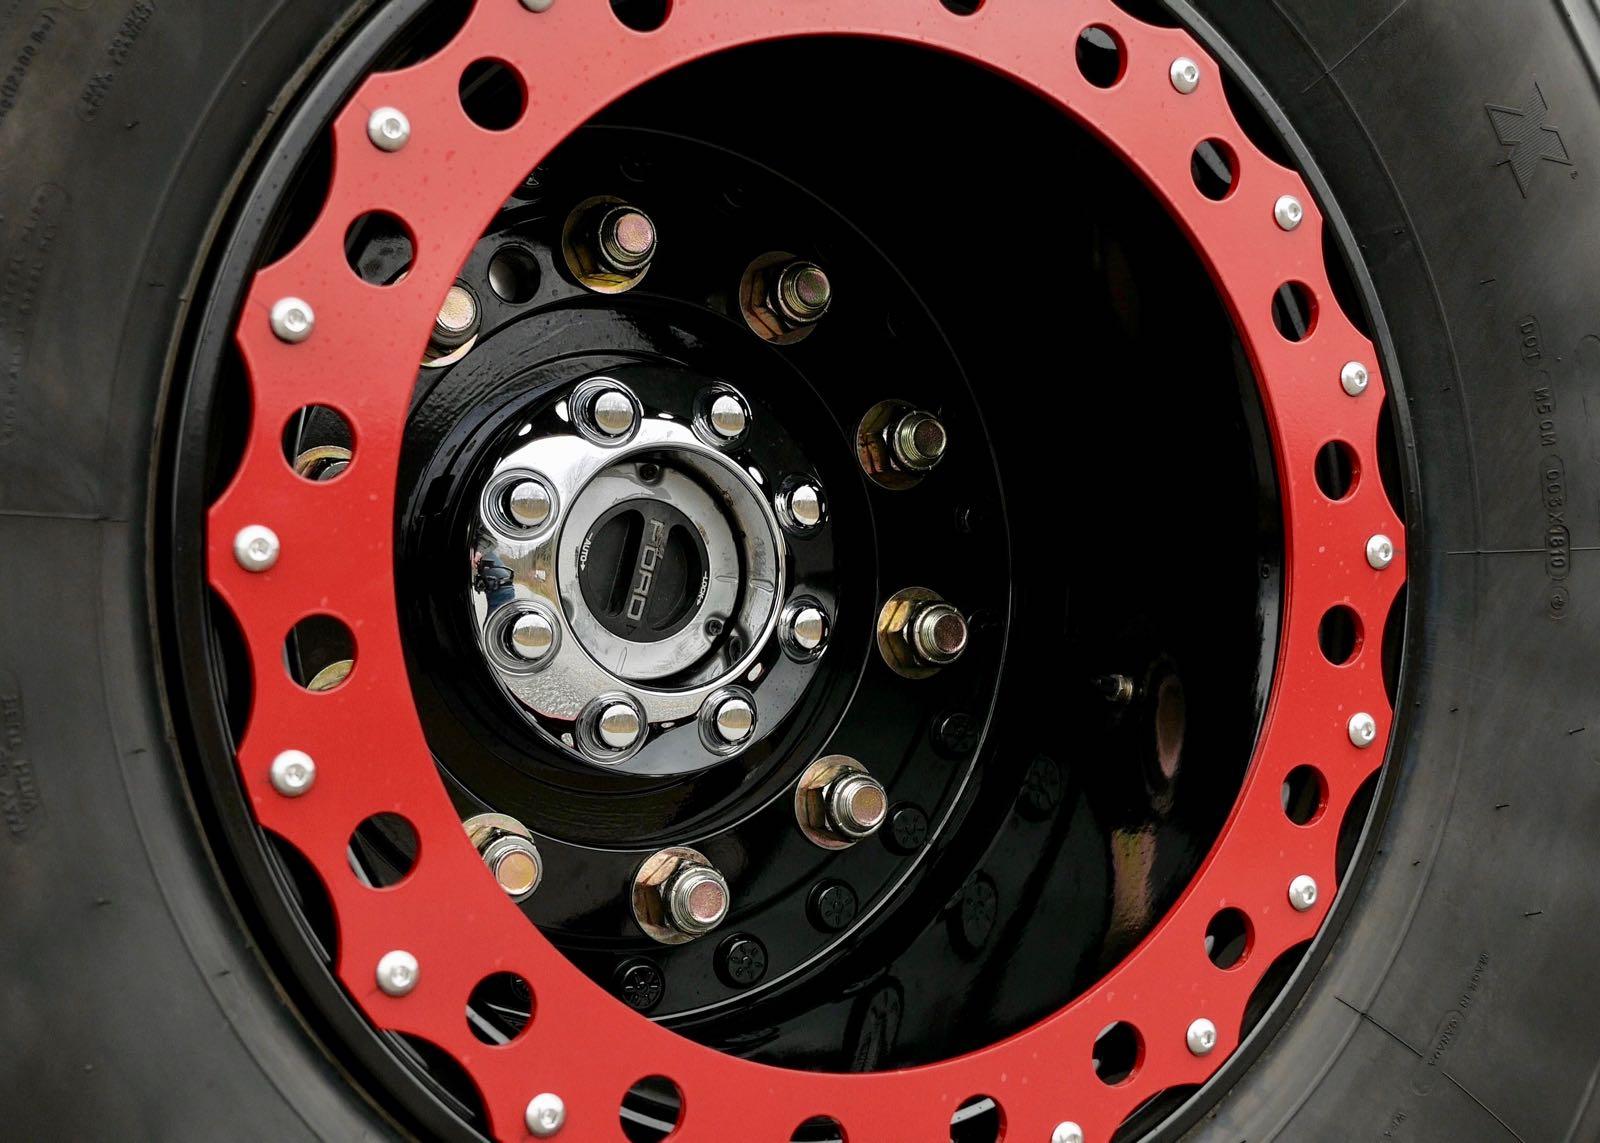 MBRP Megaraptor wheels